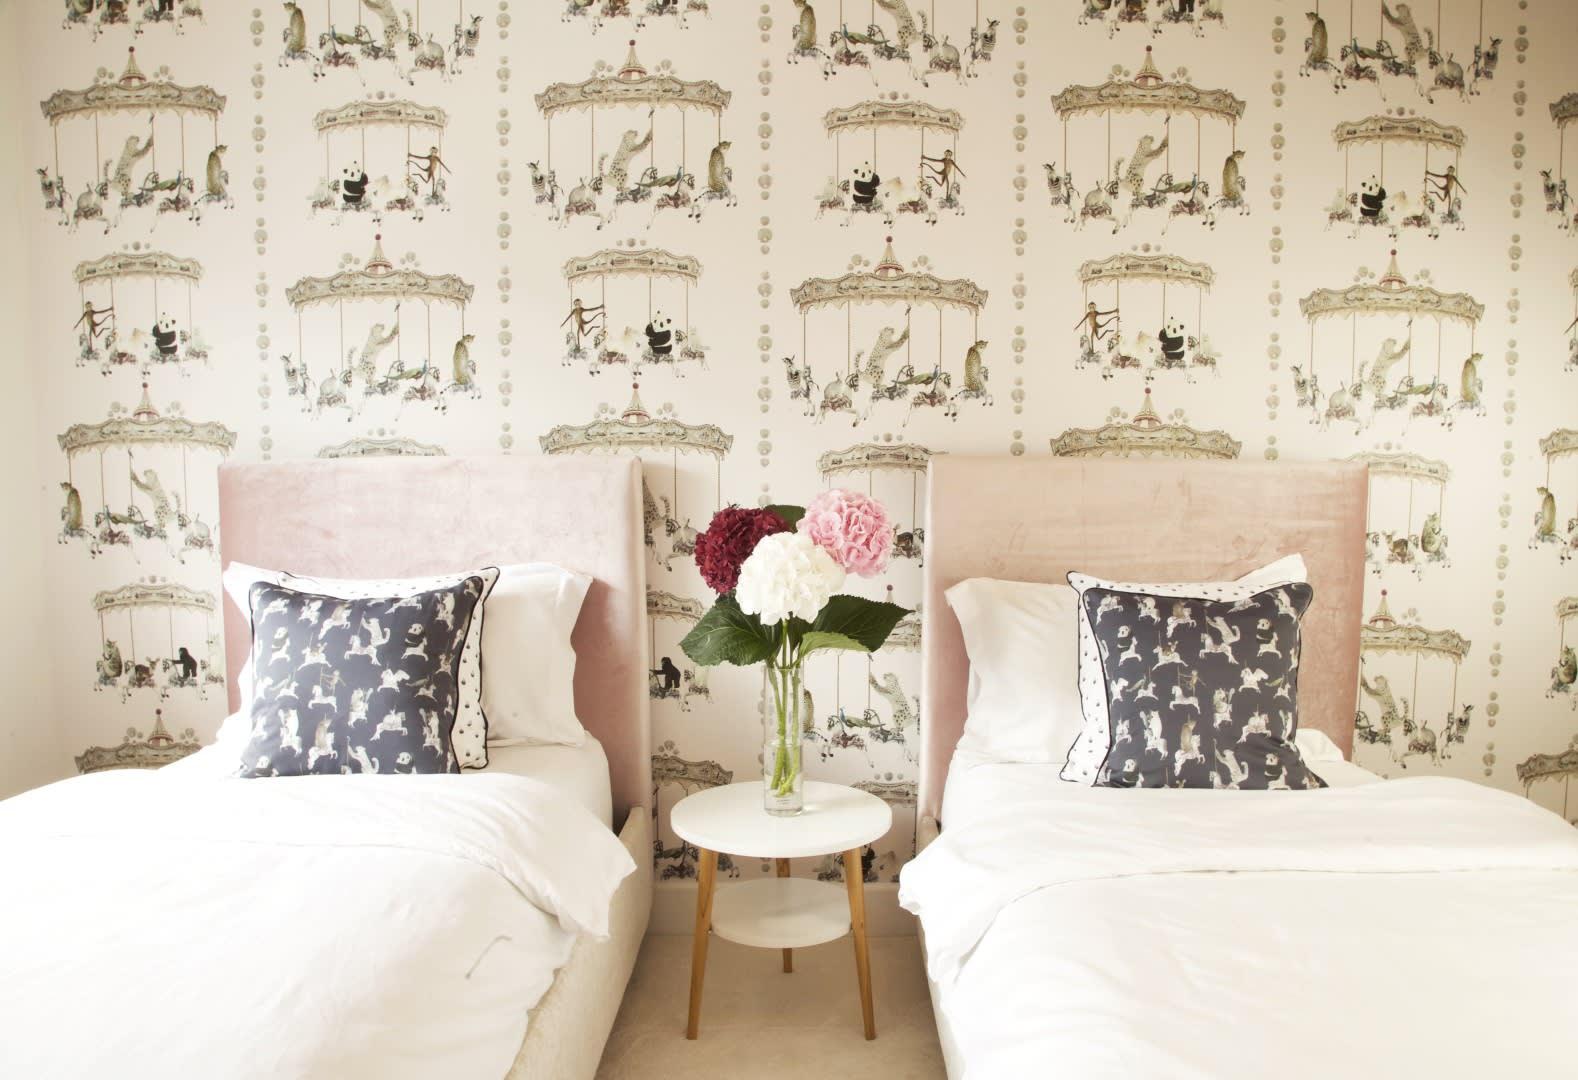 Children Bedroom Decoration Ideas 2018 - Keeping Your Kids Happy